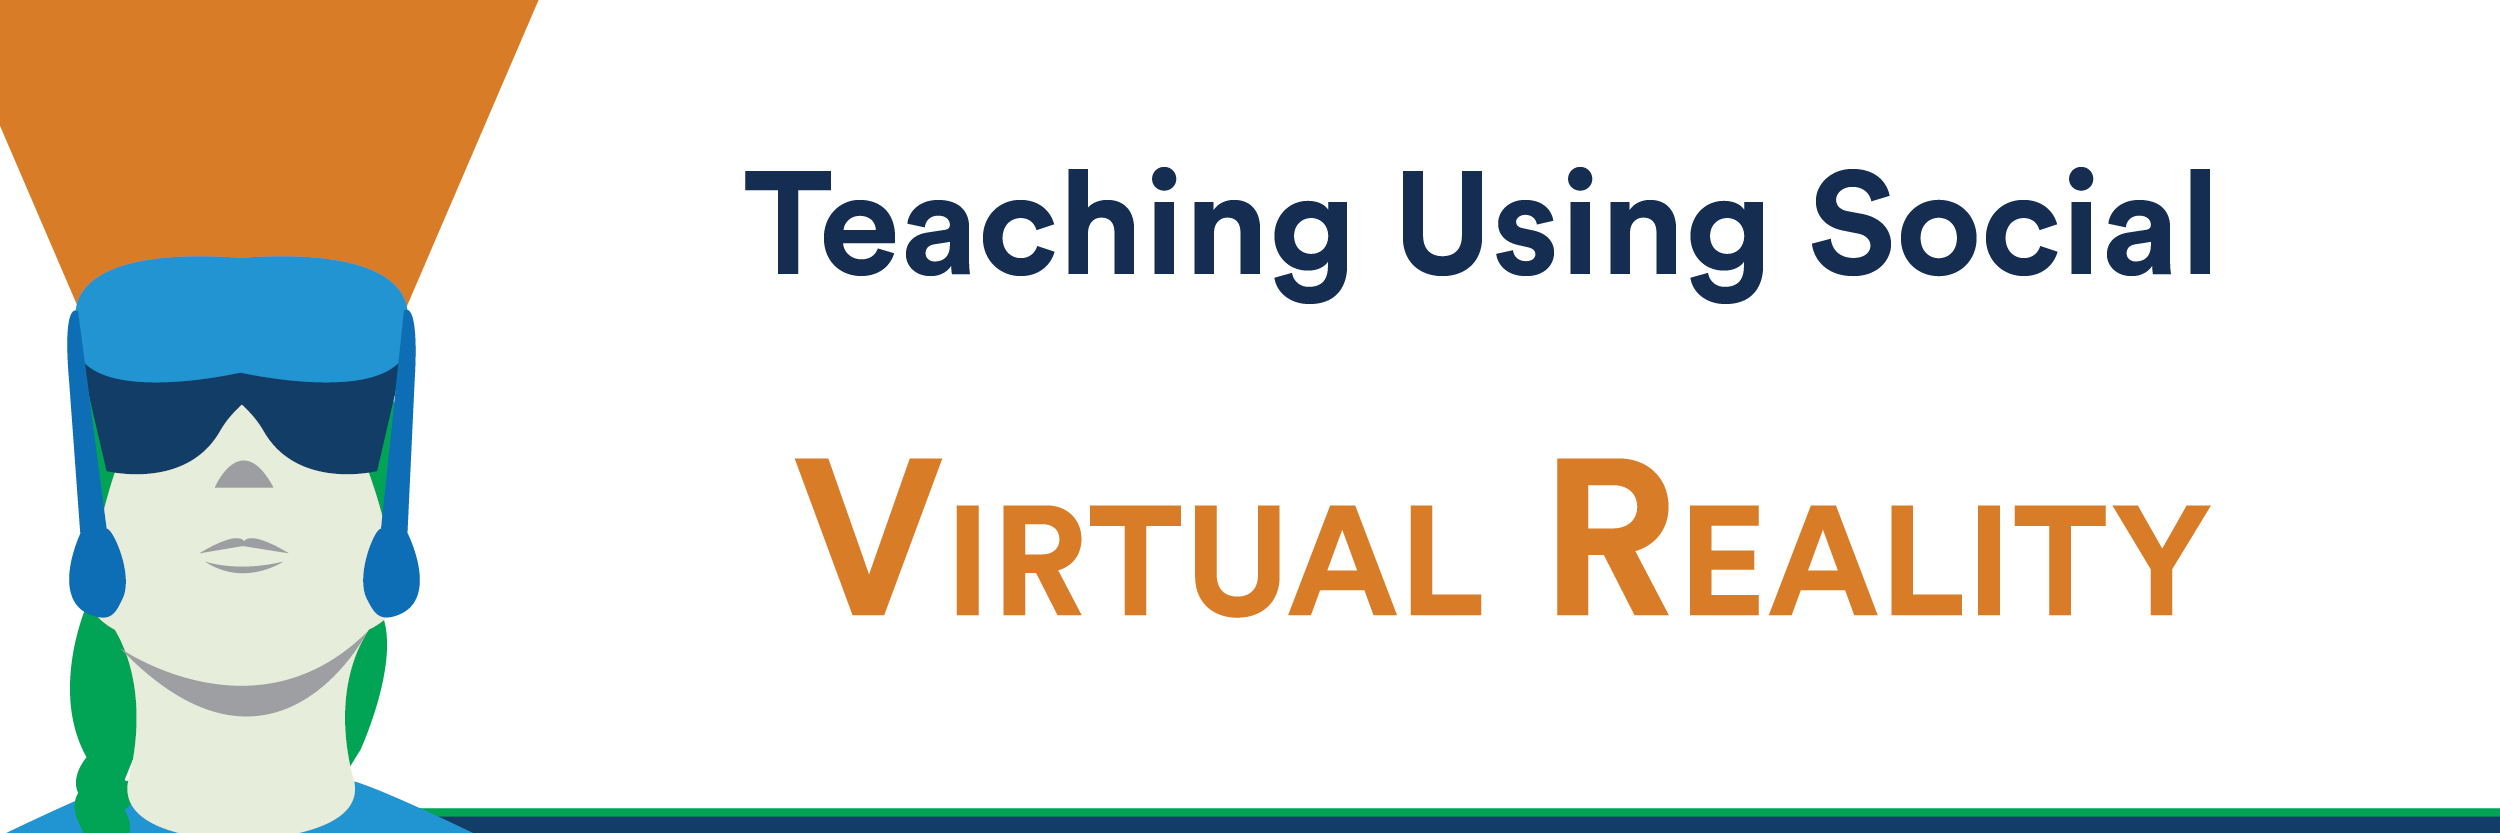 Teaching Using Social VR